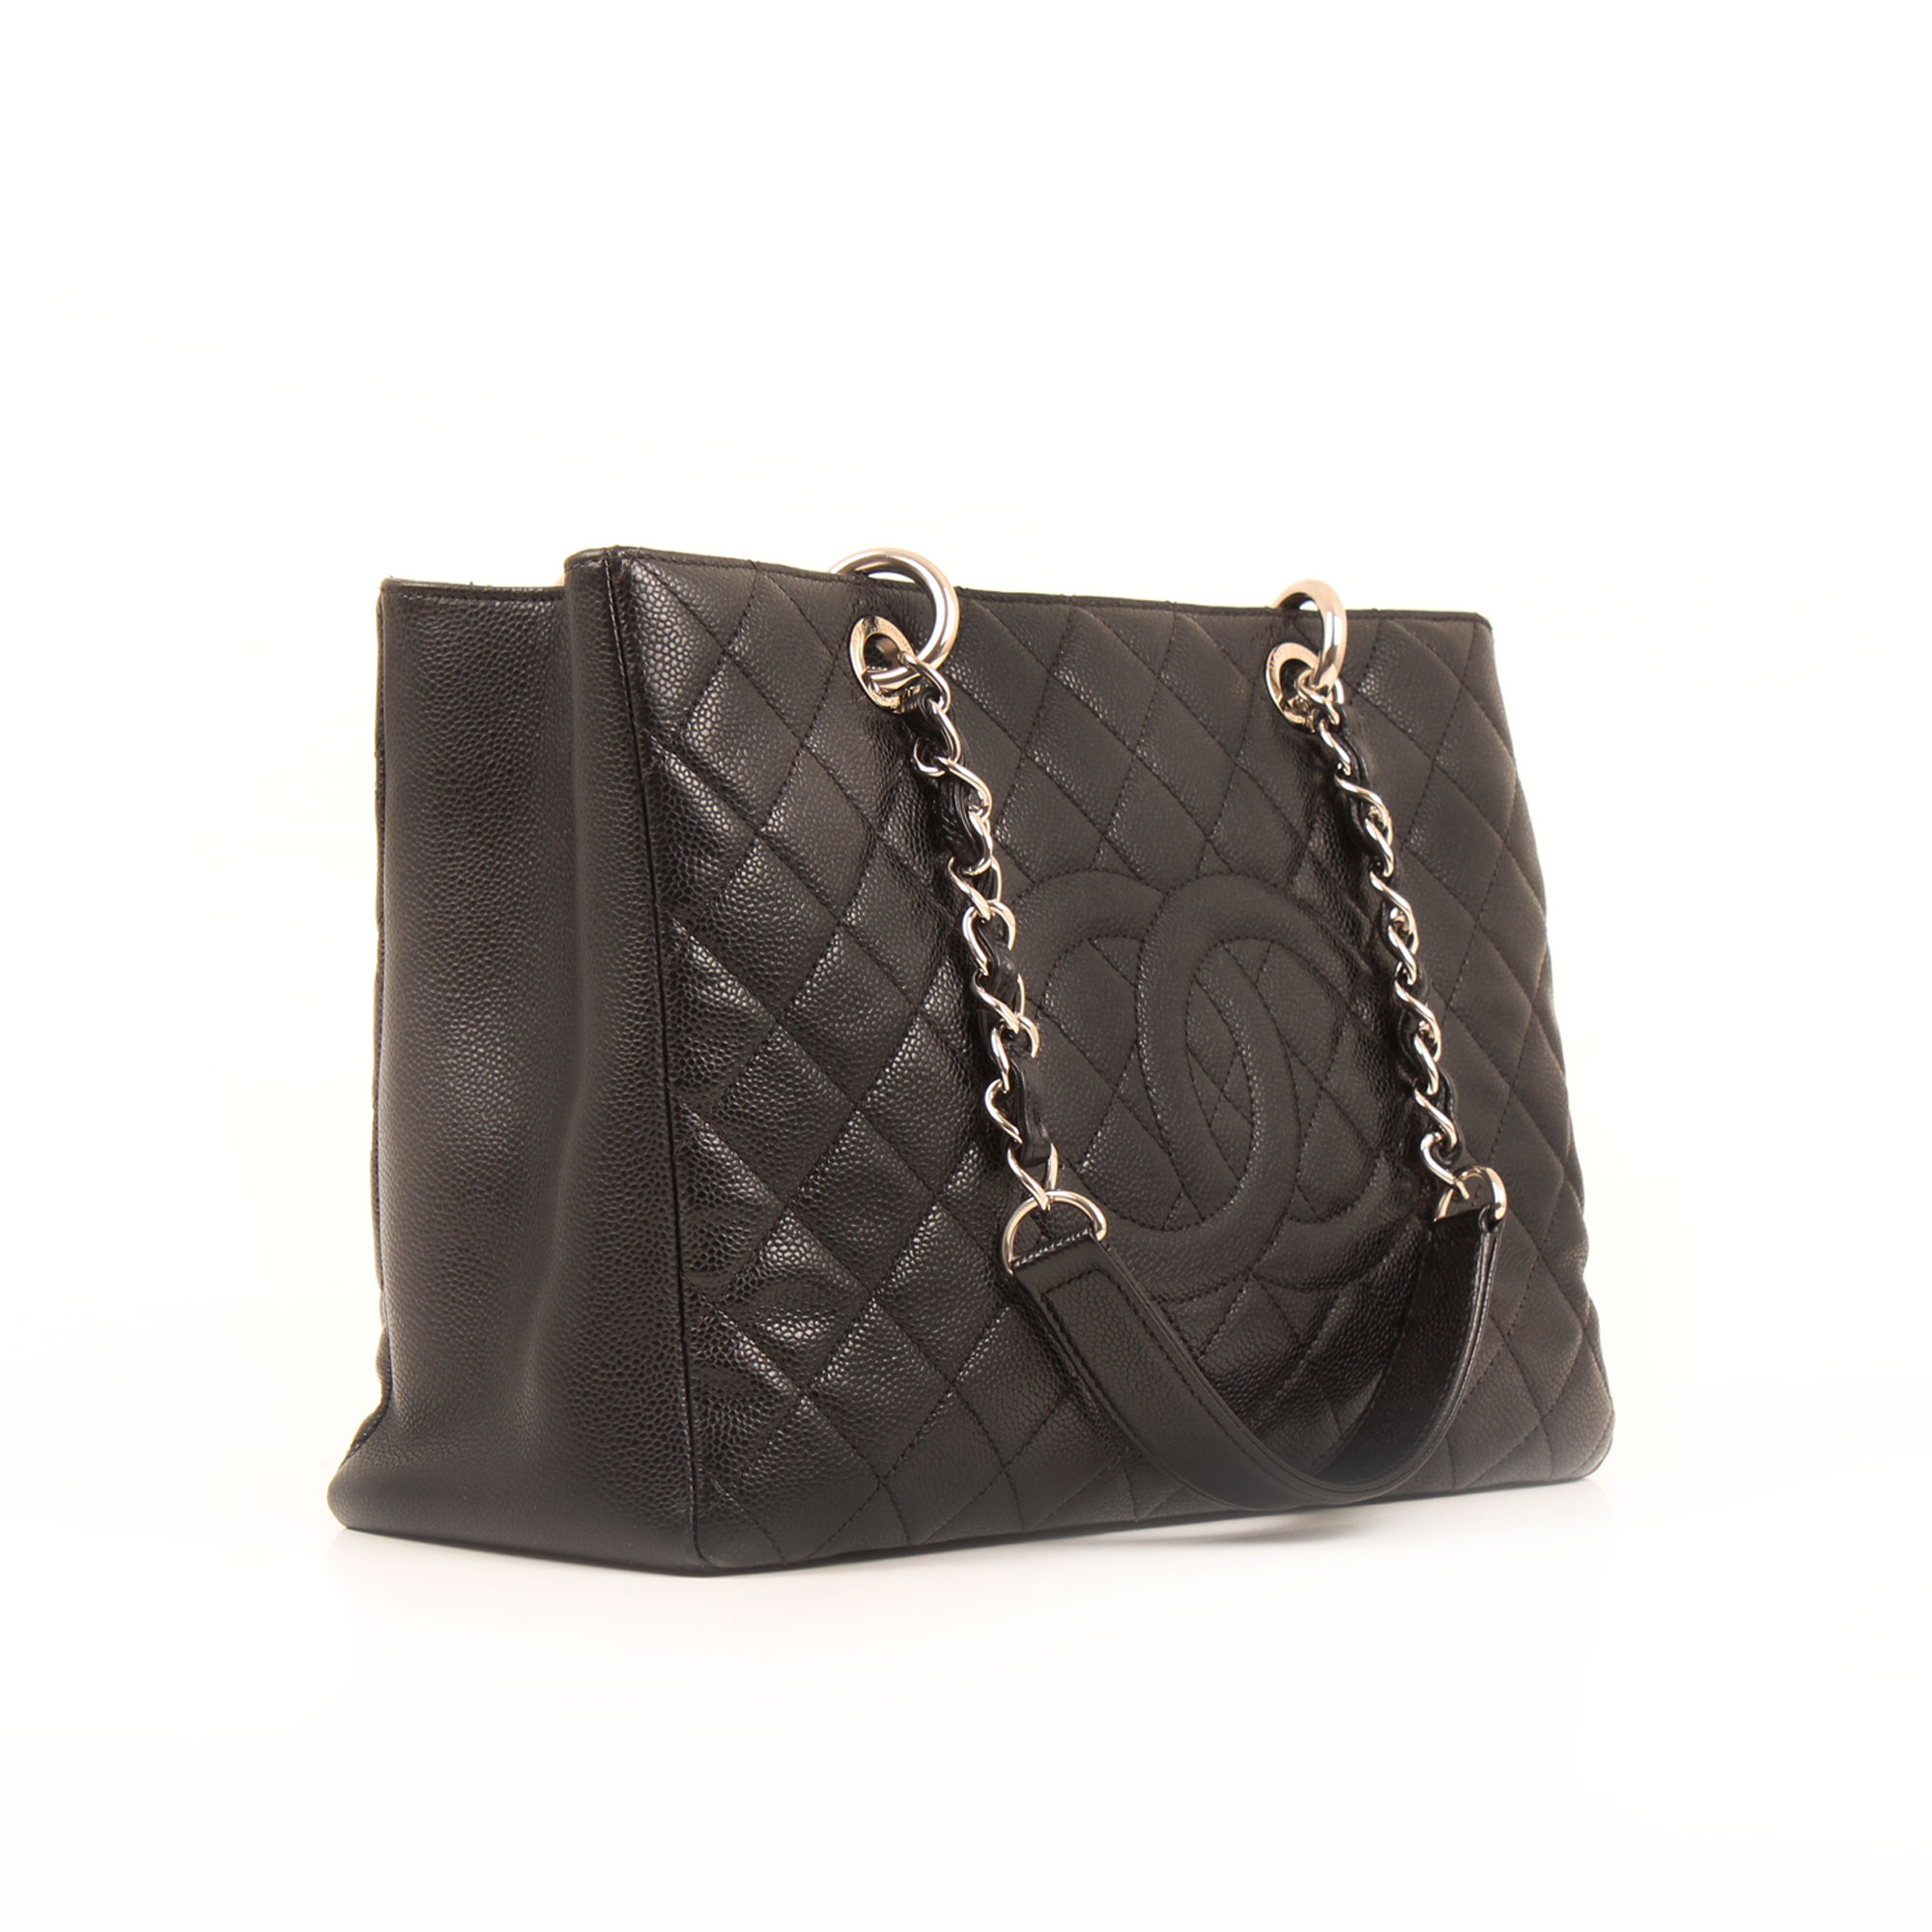 General image of chanel grand shopping tote bag black caviar